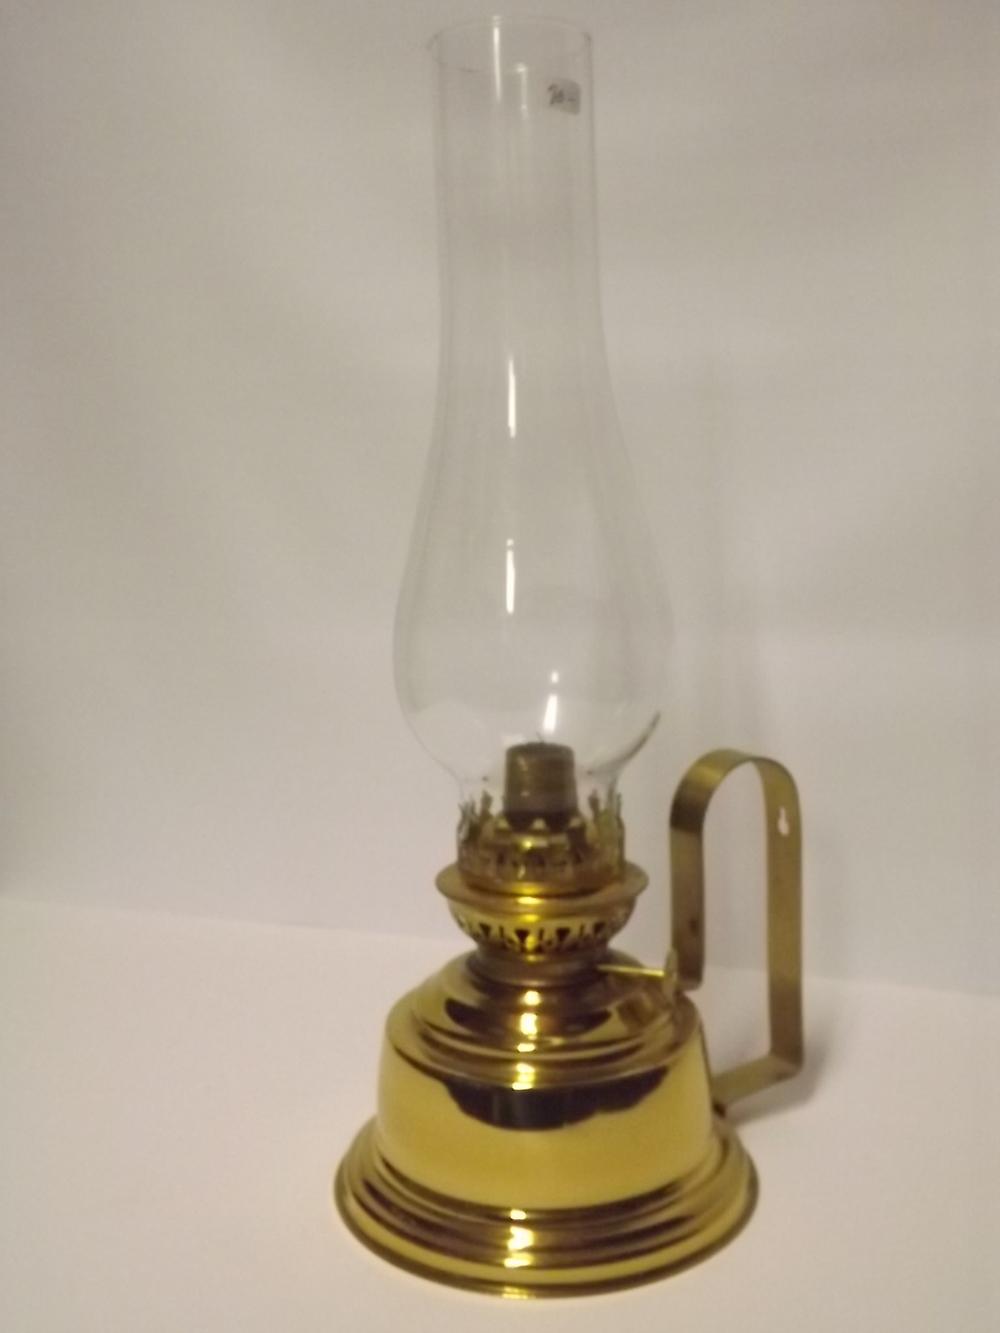 Br. Wall bracket lamp - kosmos burner